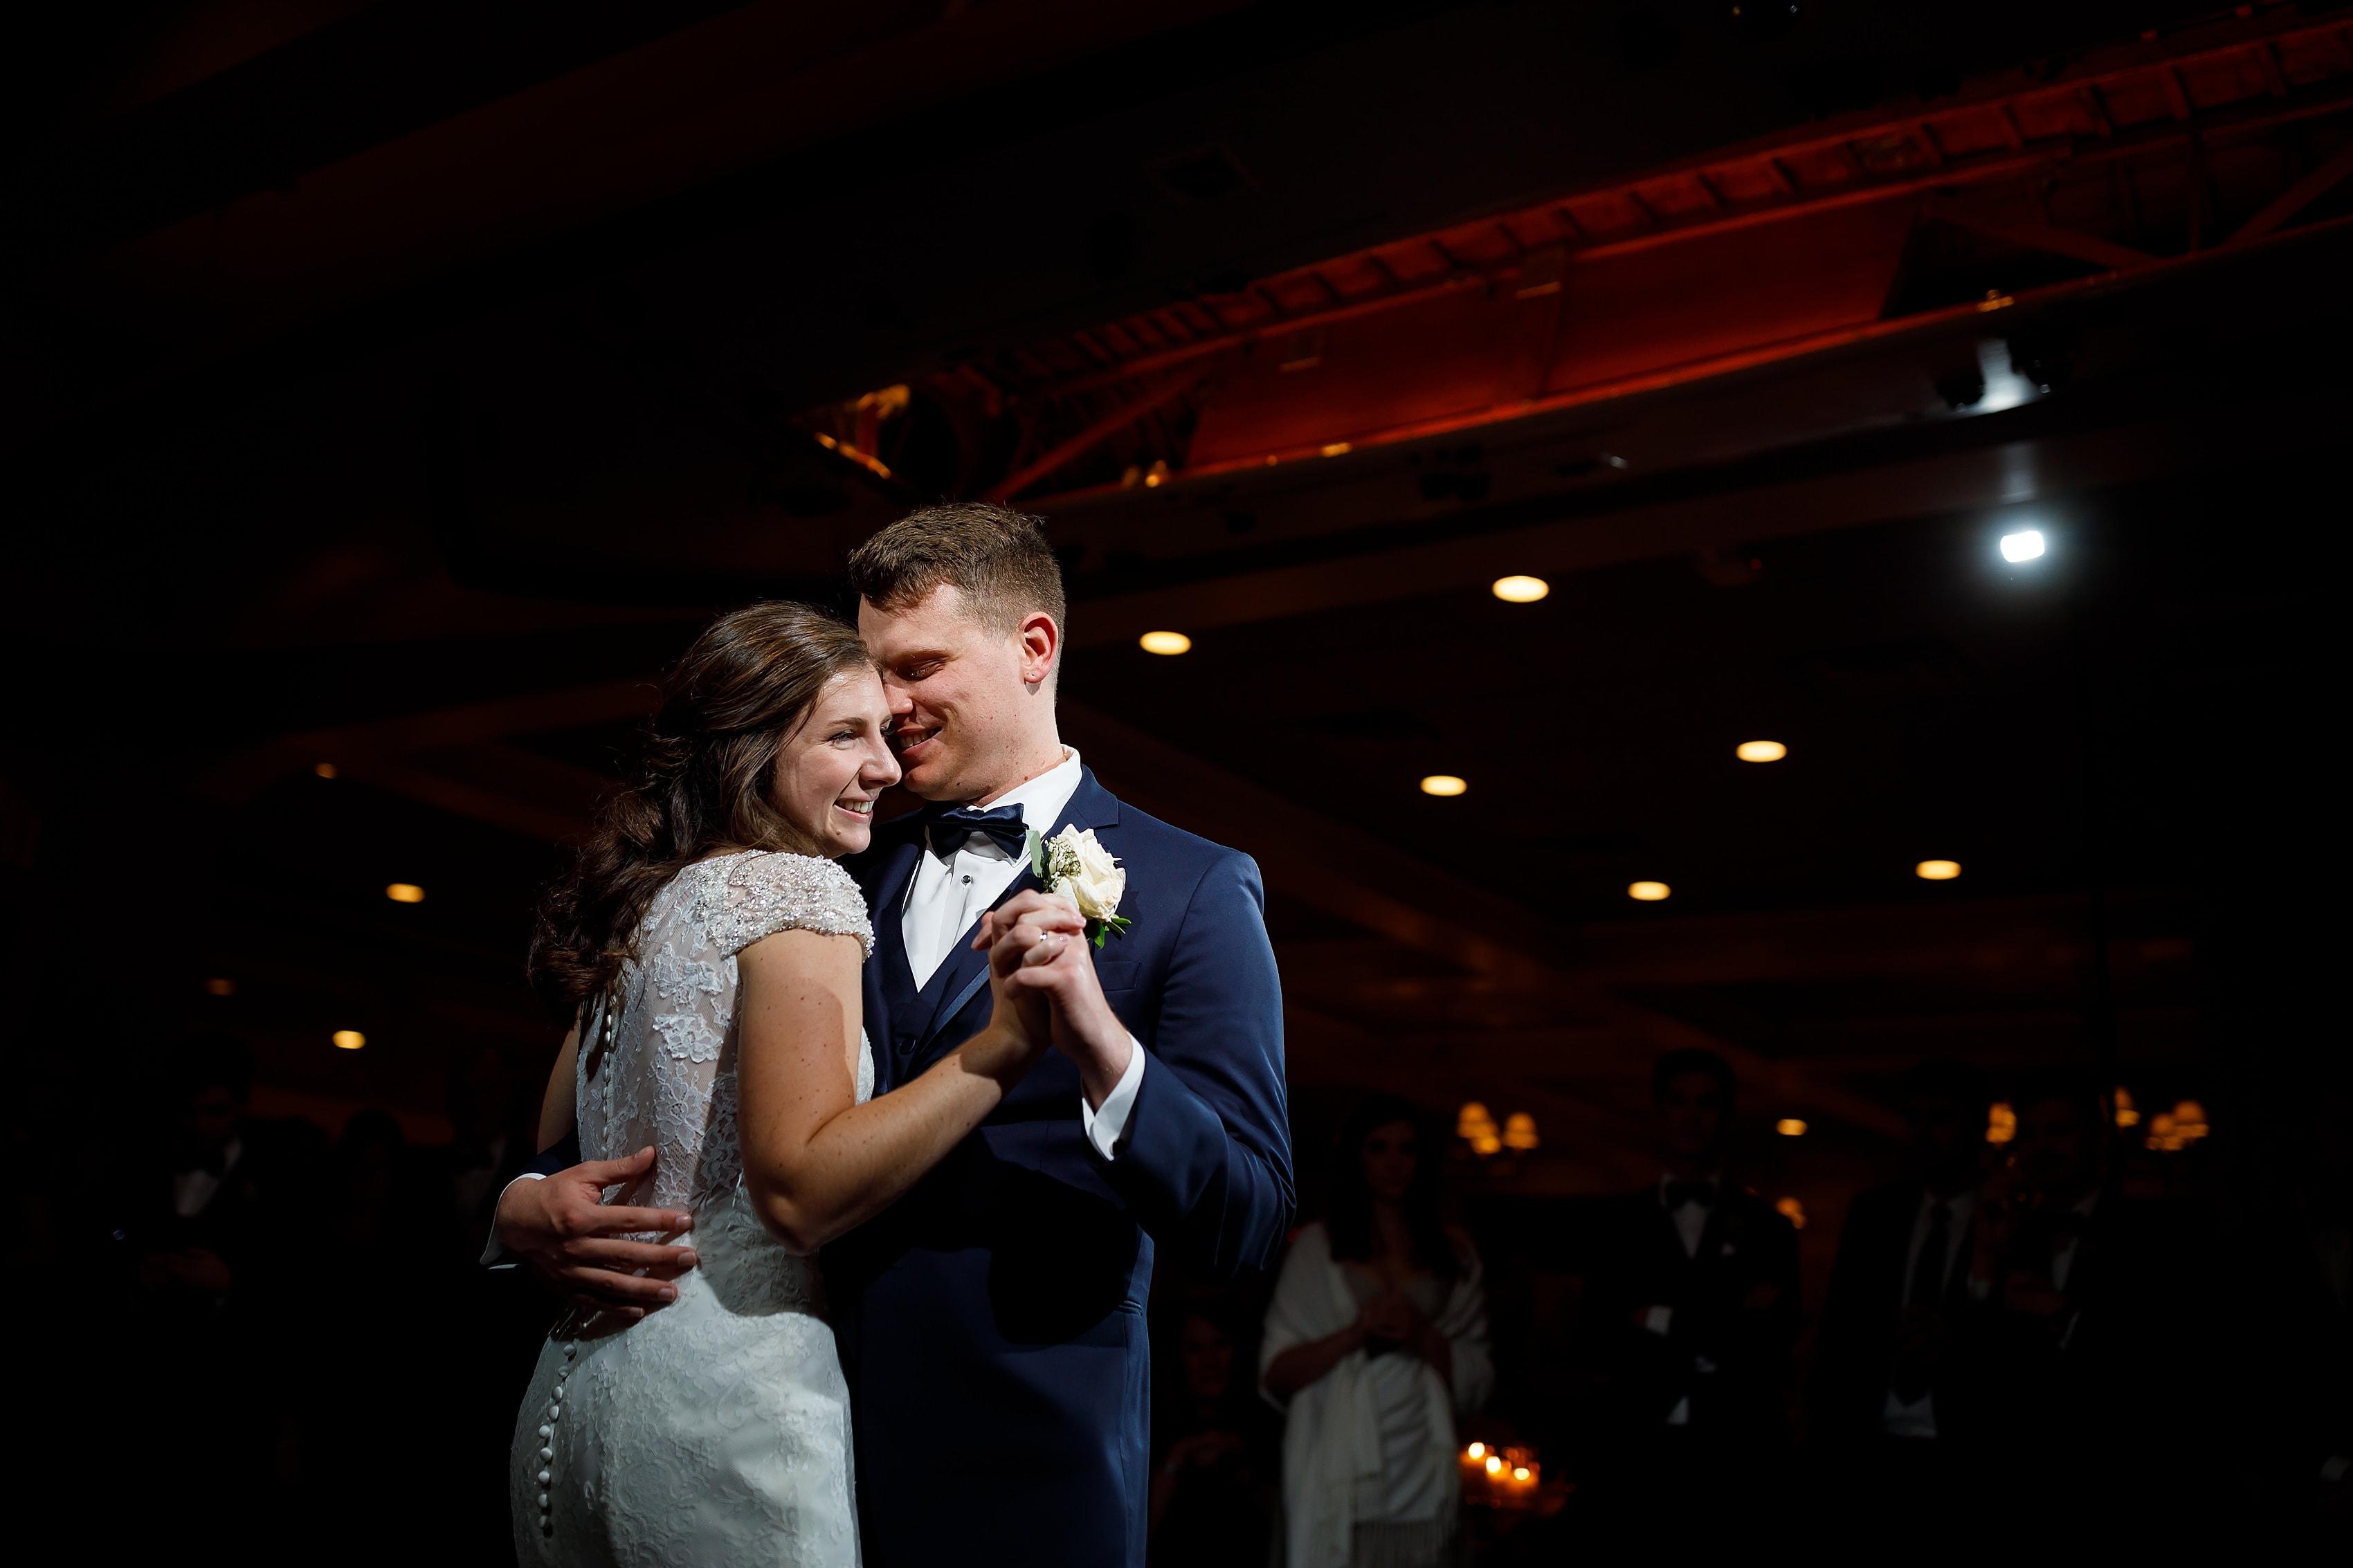 Bride and groom share first dance at Lake Geneva Yacht Club in Lake Geneva, Wisconsin